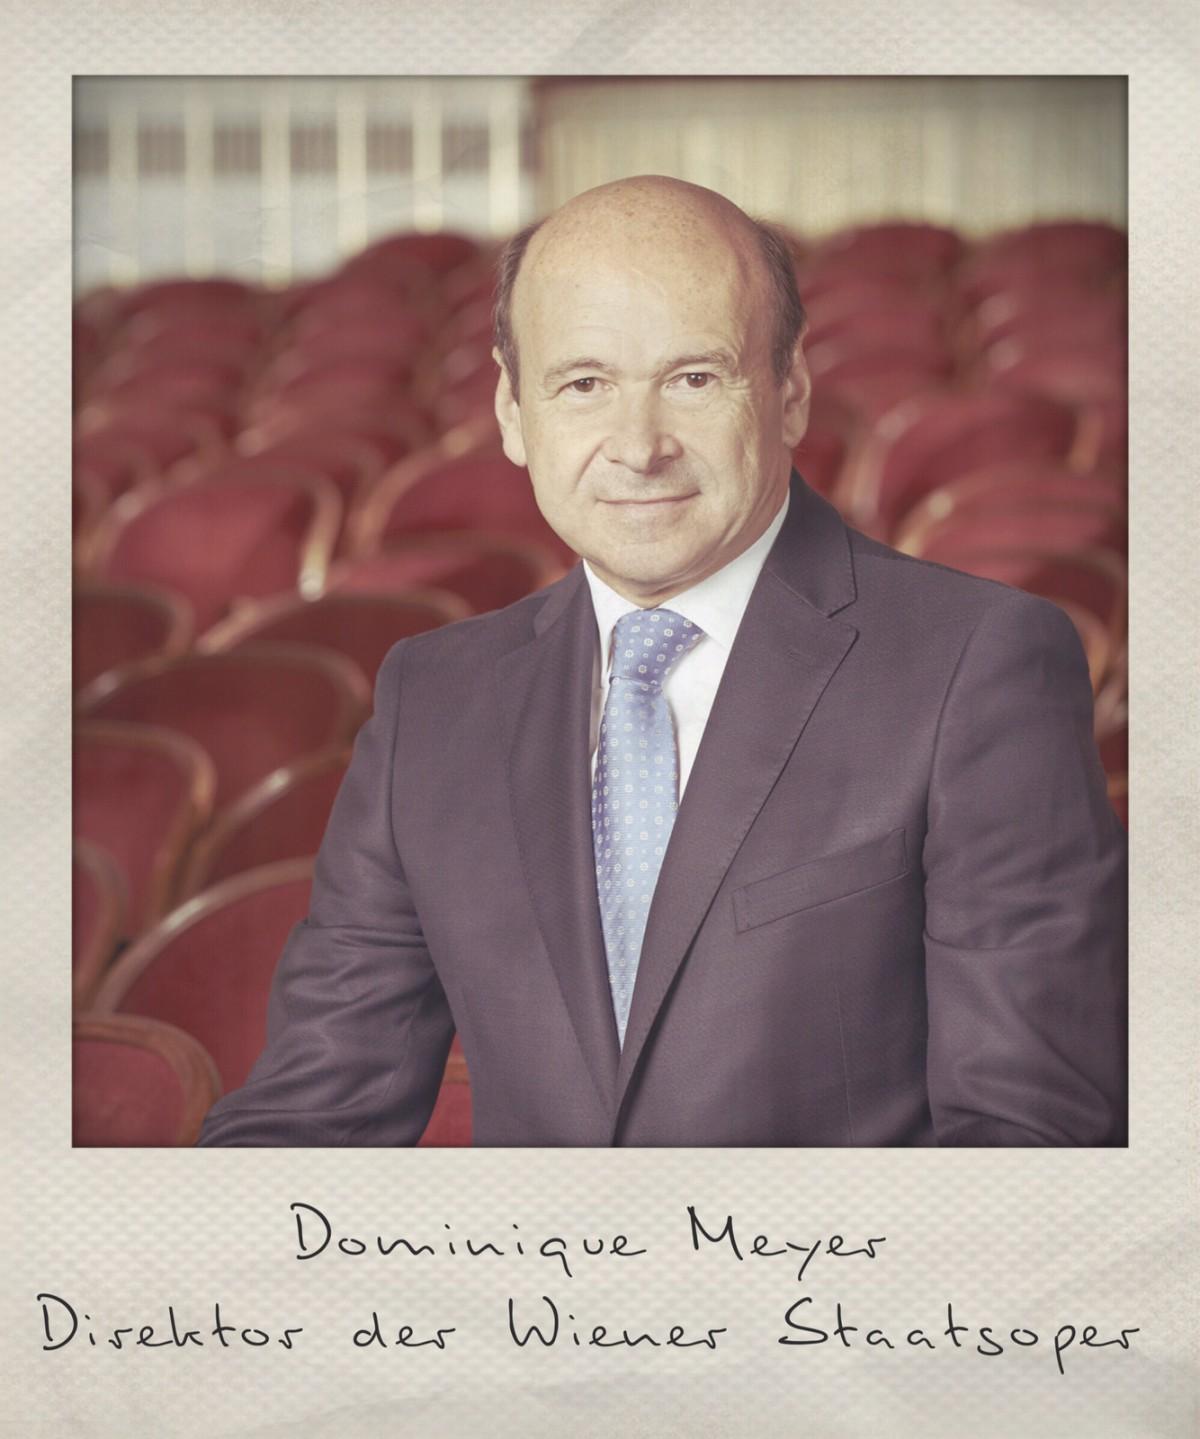 DominiqueMeyer